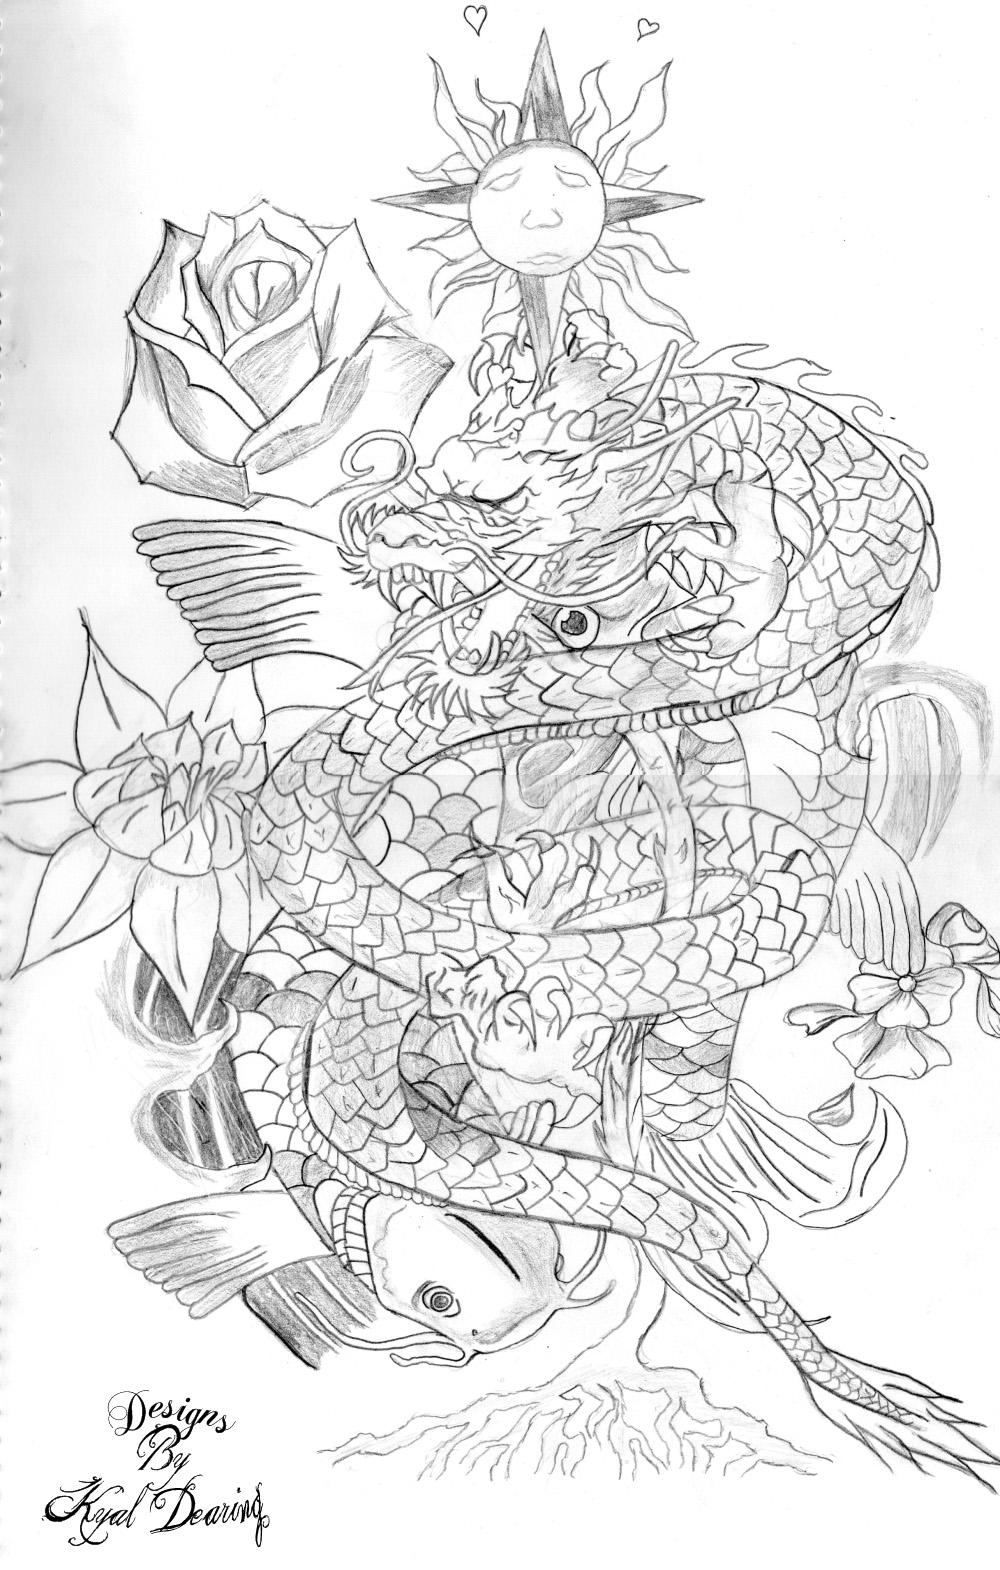 Dragon, Koi Fish Tattoo Design by DesignsByKyalDearing on ...Koi Fish Dragon Tattoo Designs